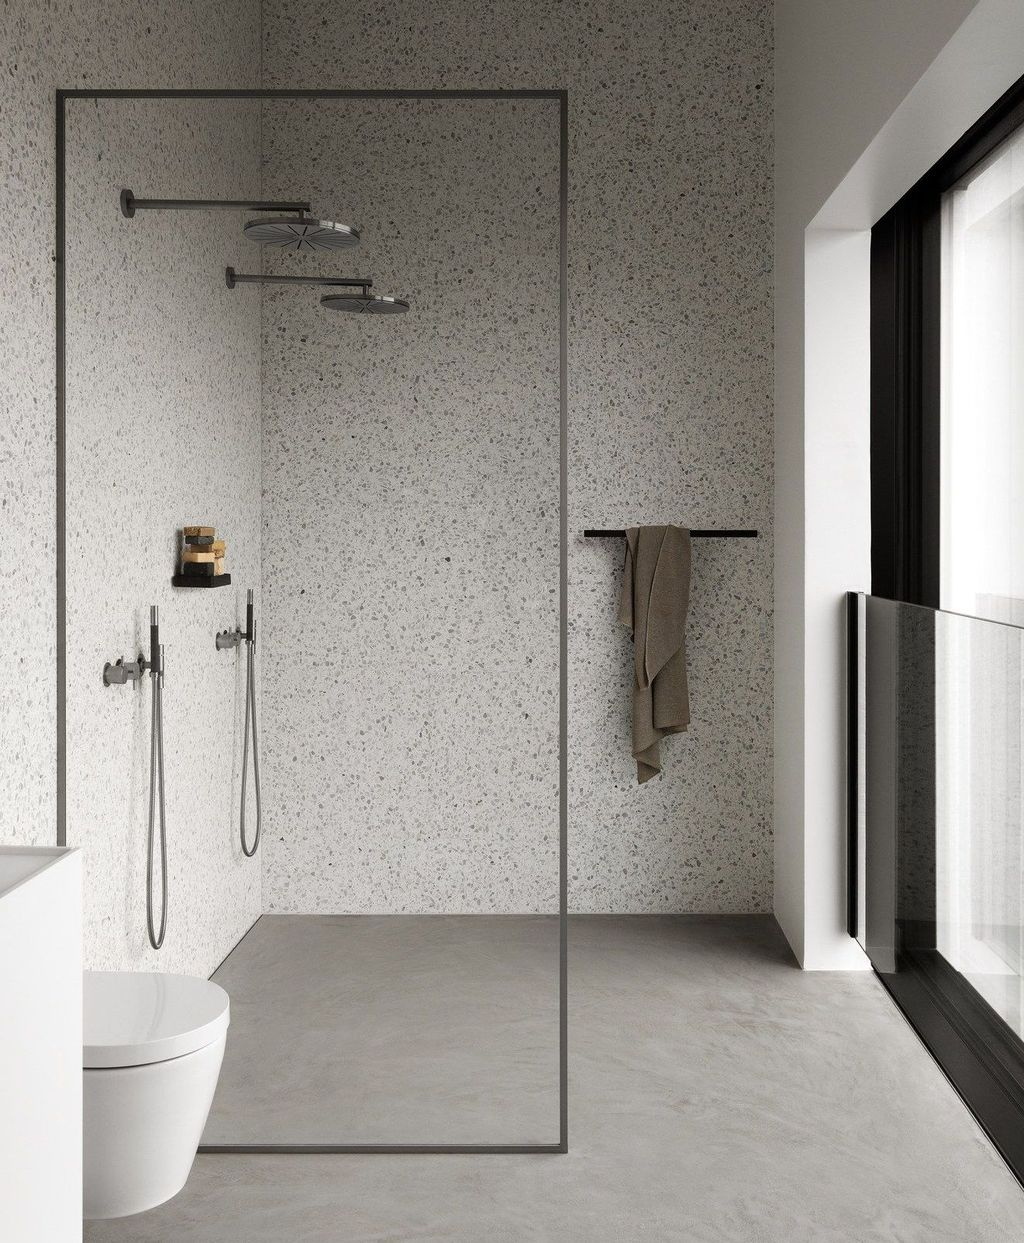 Best Minimalist Bathroom Design Ideas That Trendy Now 29